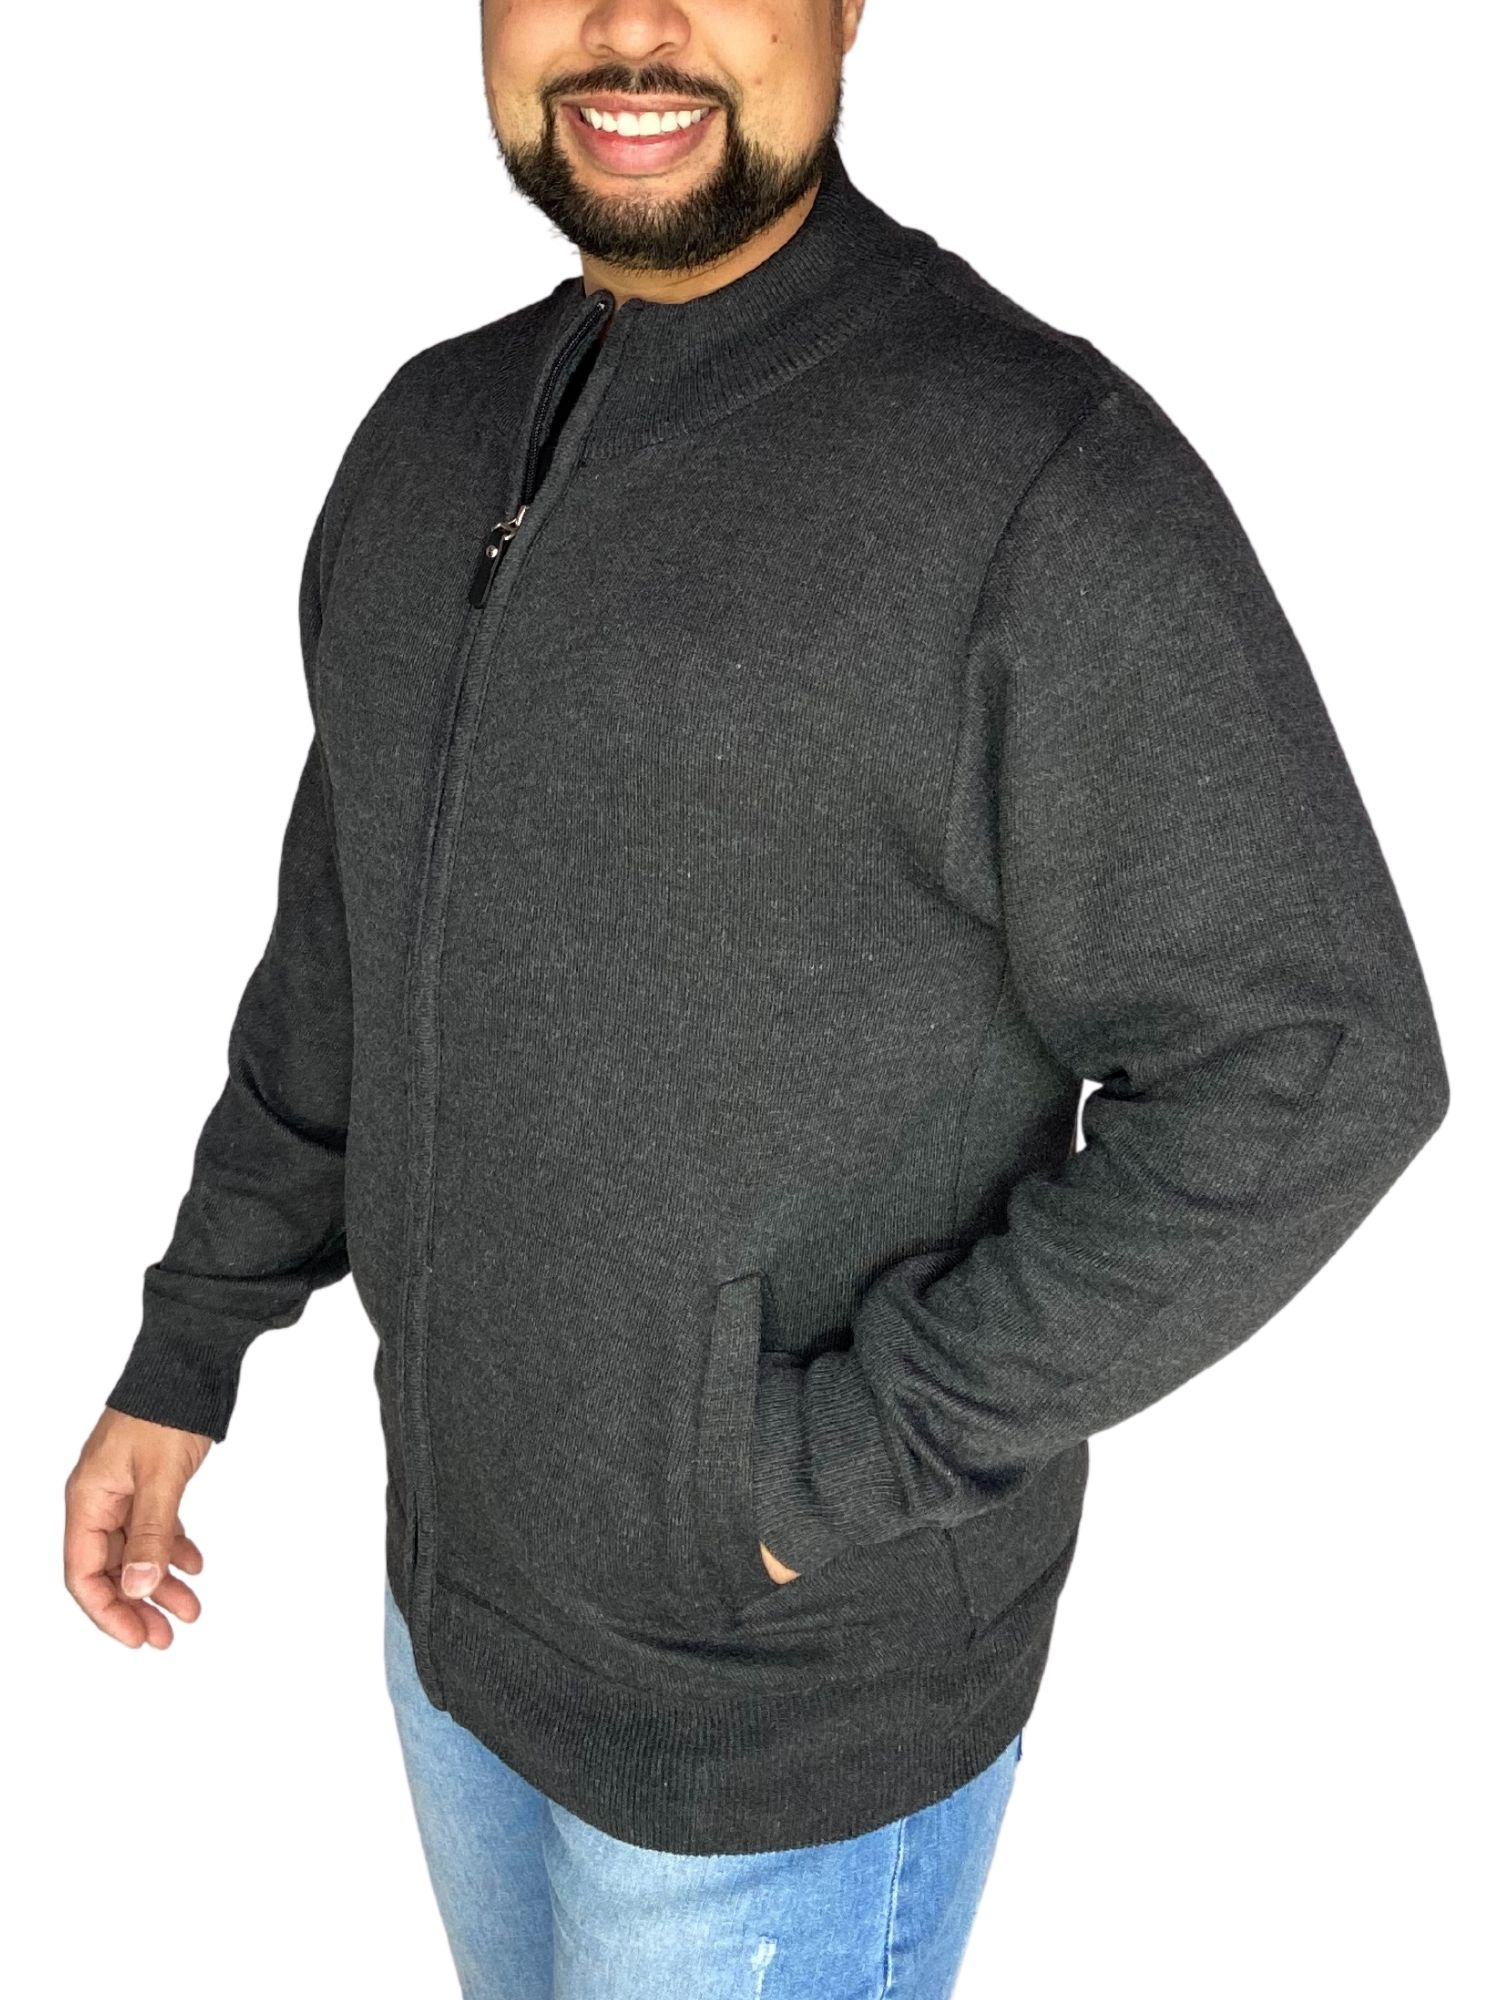 Cardigan Masculino Tricot Zíper Plus Size 598003